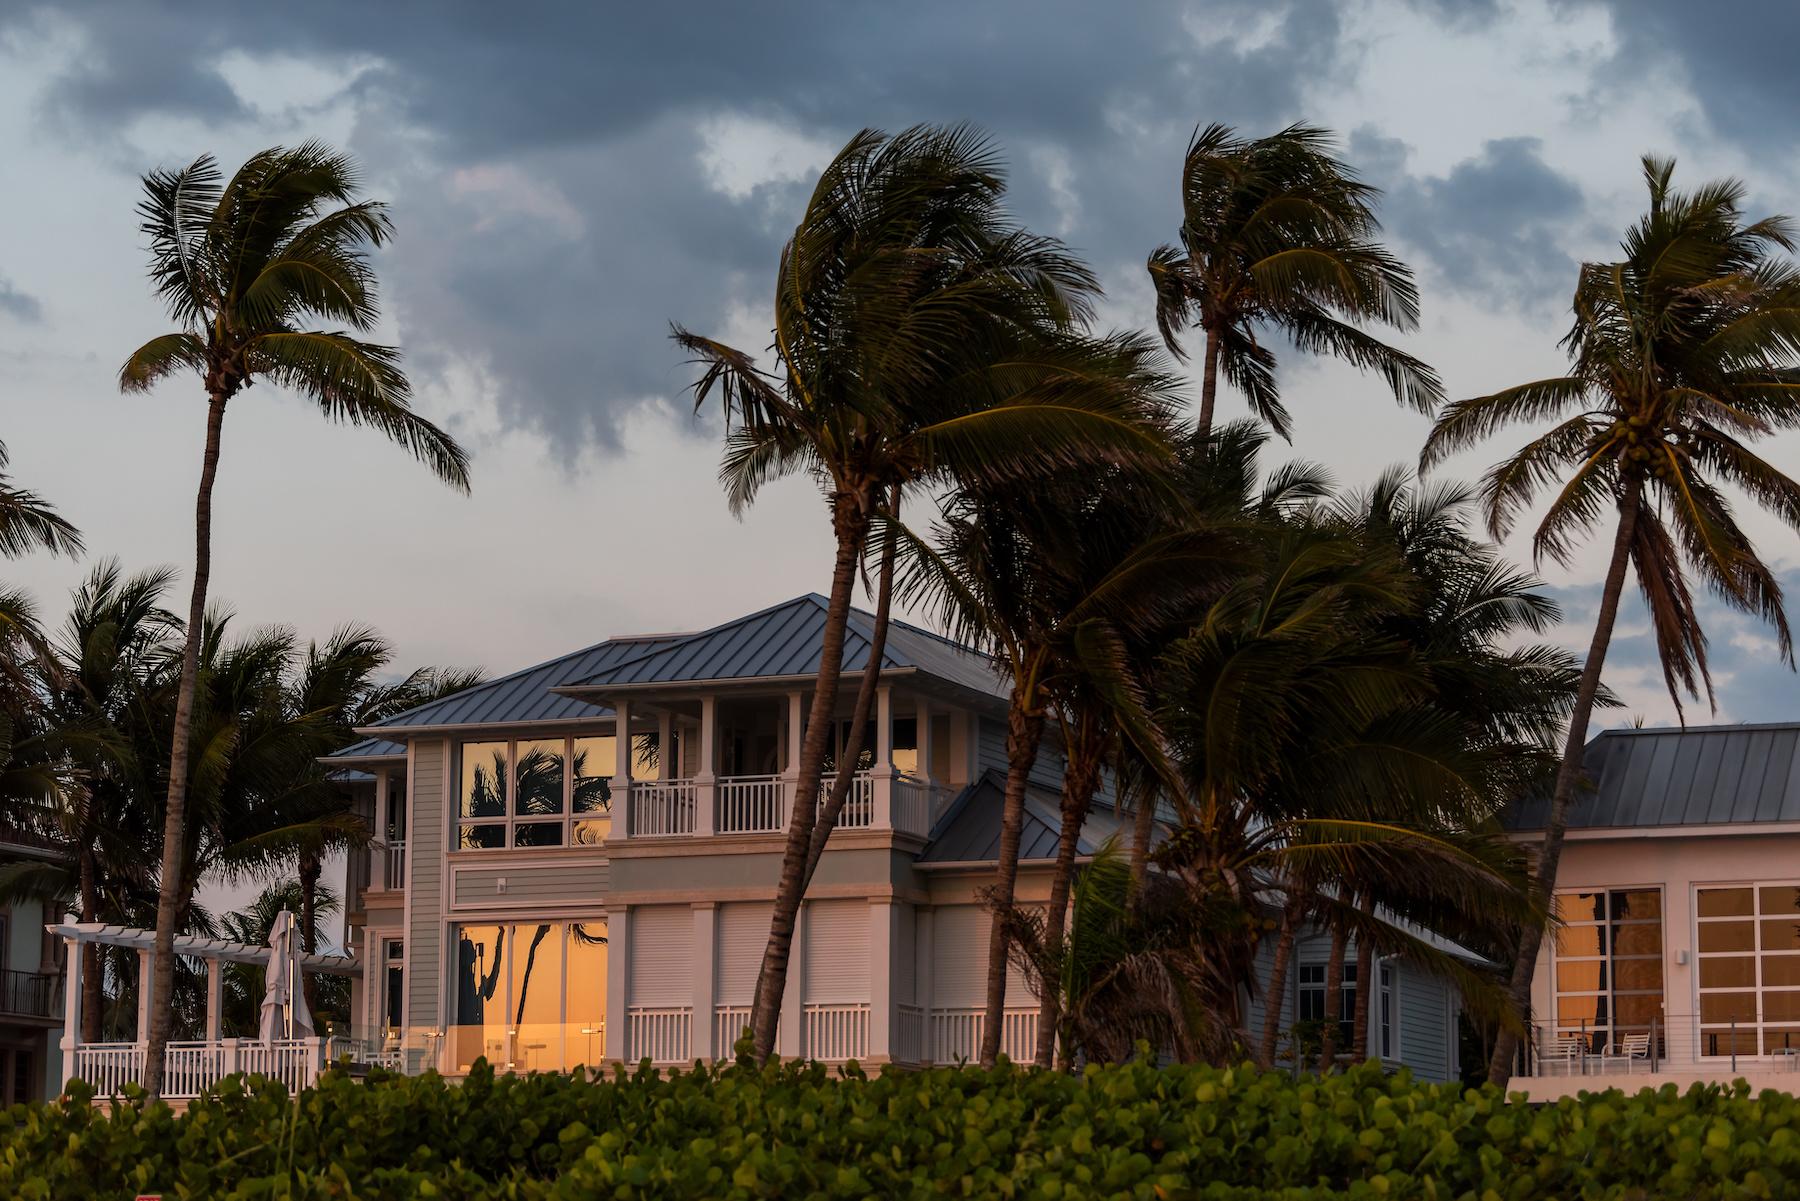 Wind/Hurricane Damage Insurance Claims Miami FL